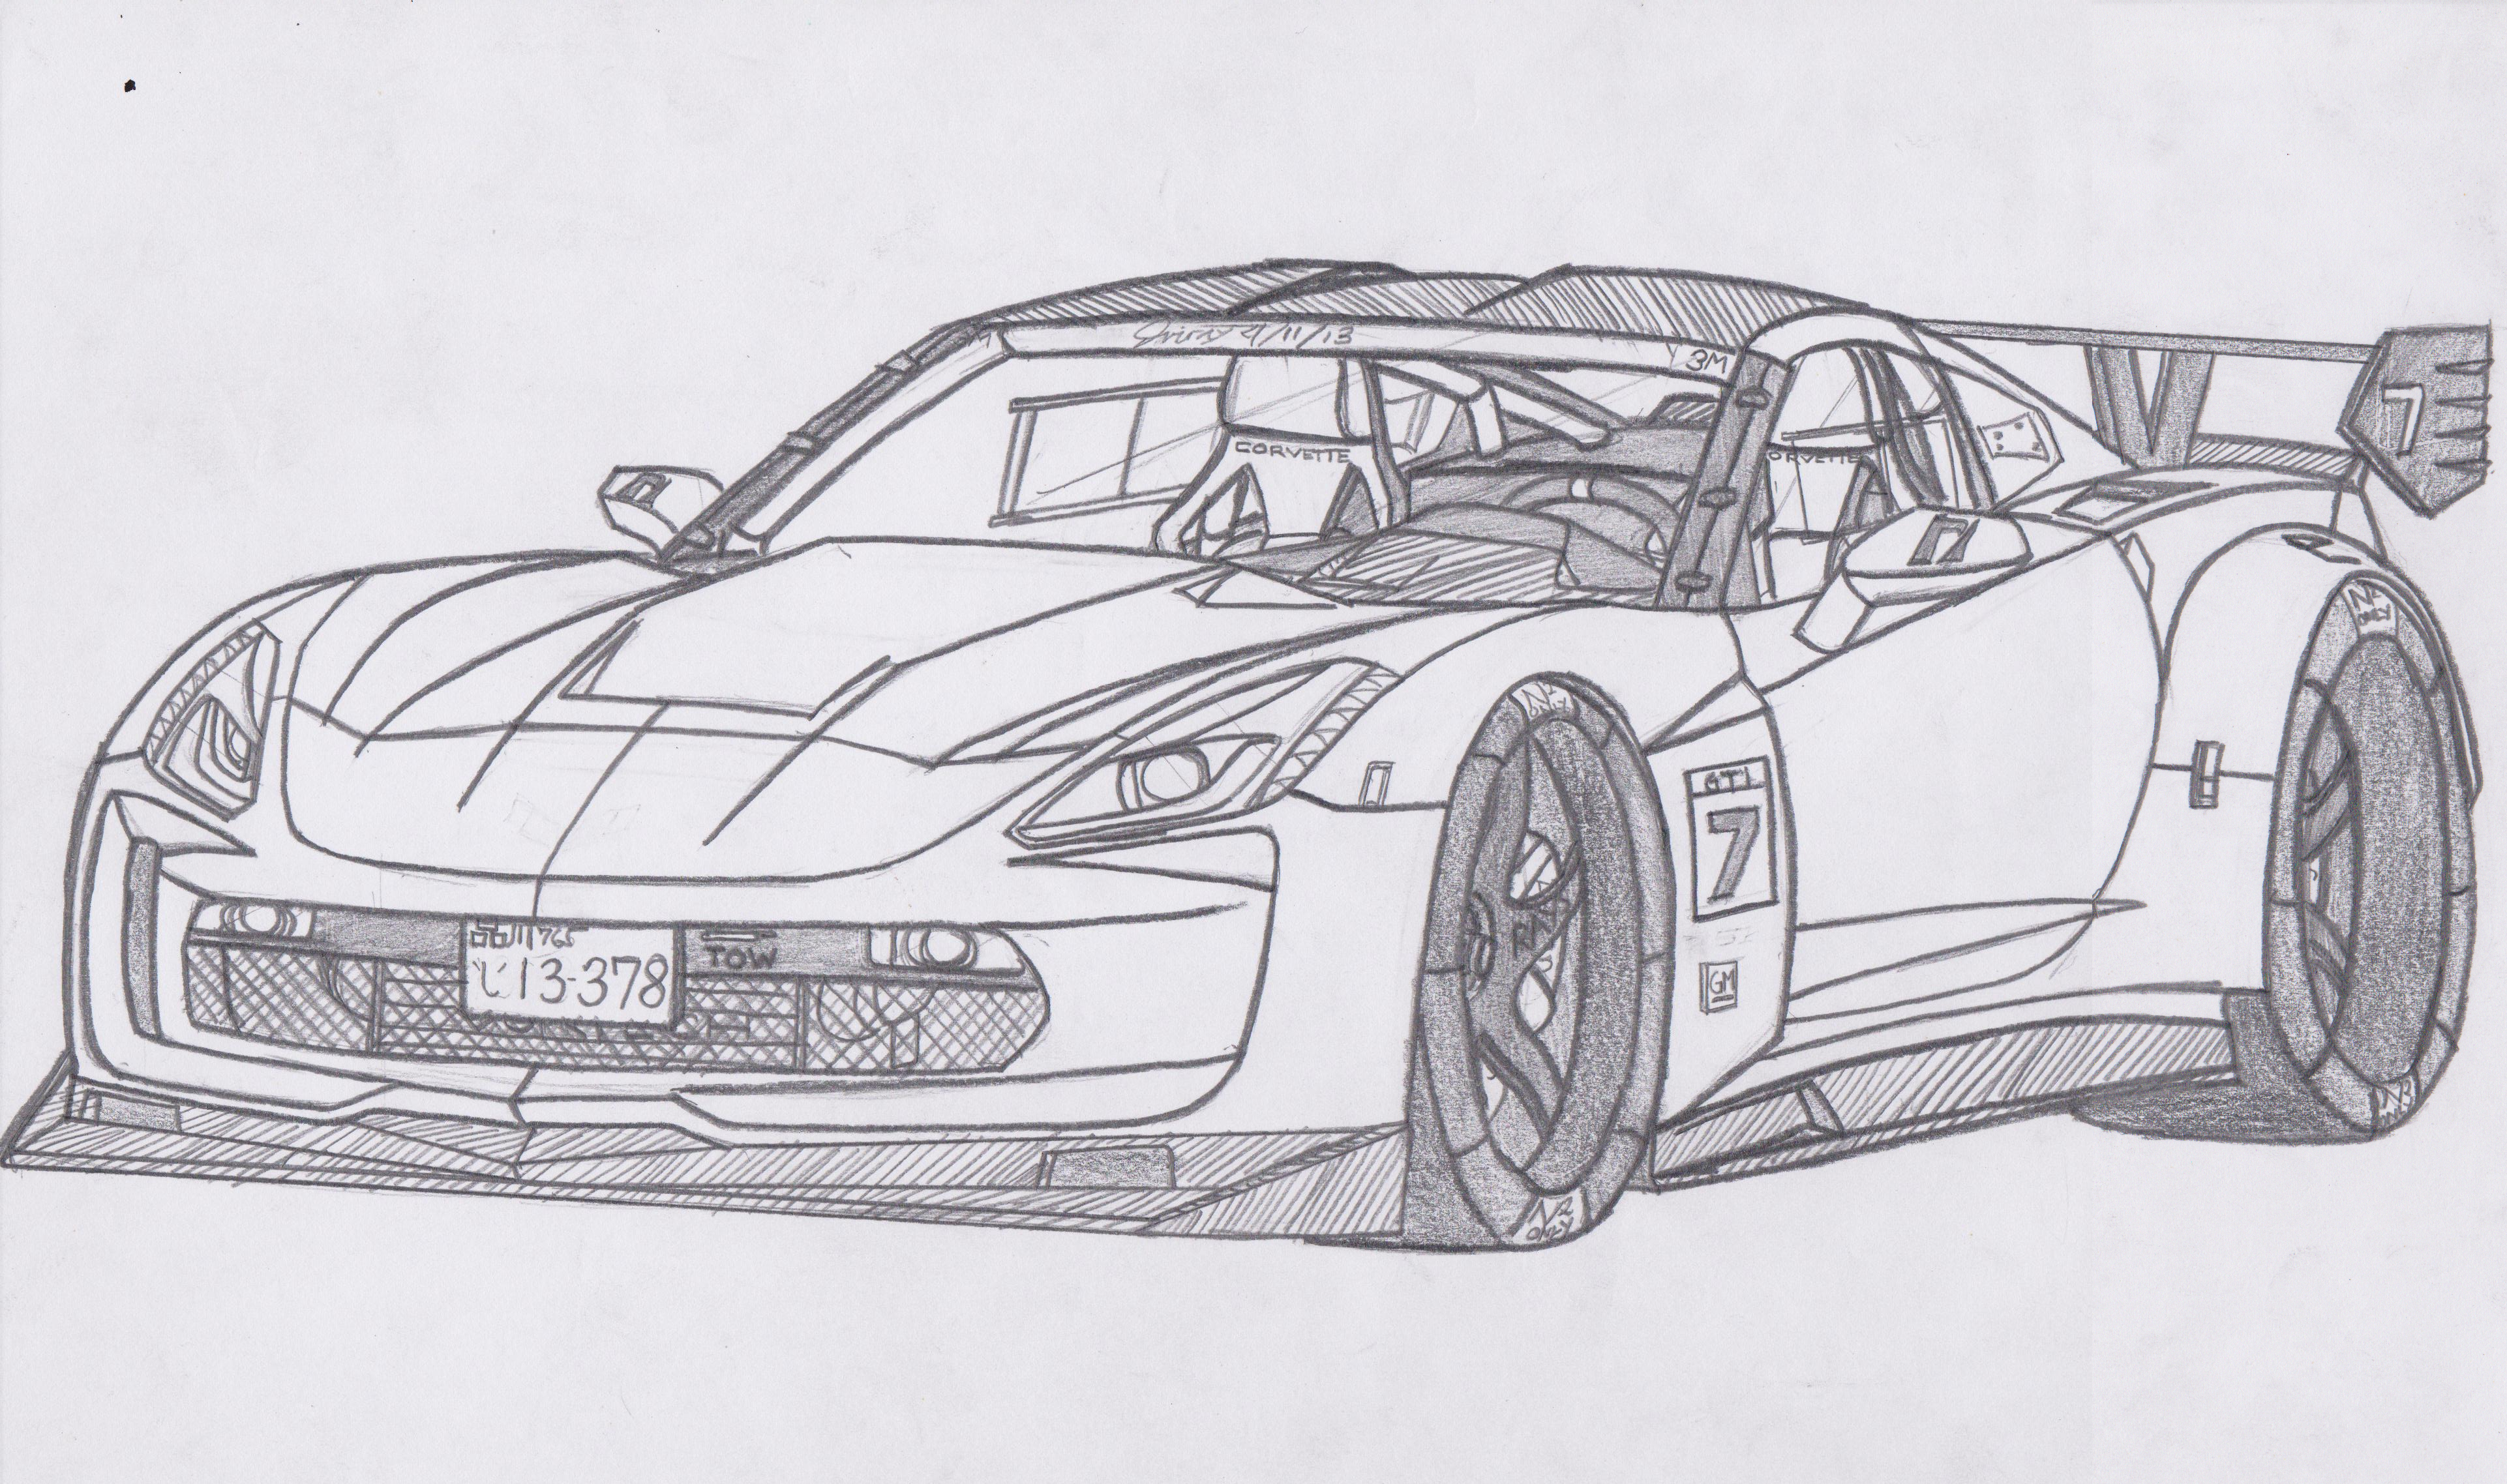 Chevy corvette coloring pages cars automobiles pictures for Corvette car coloring pages